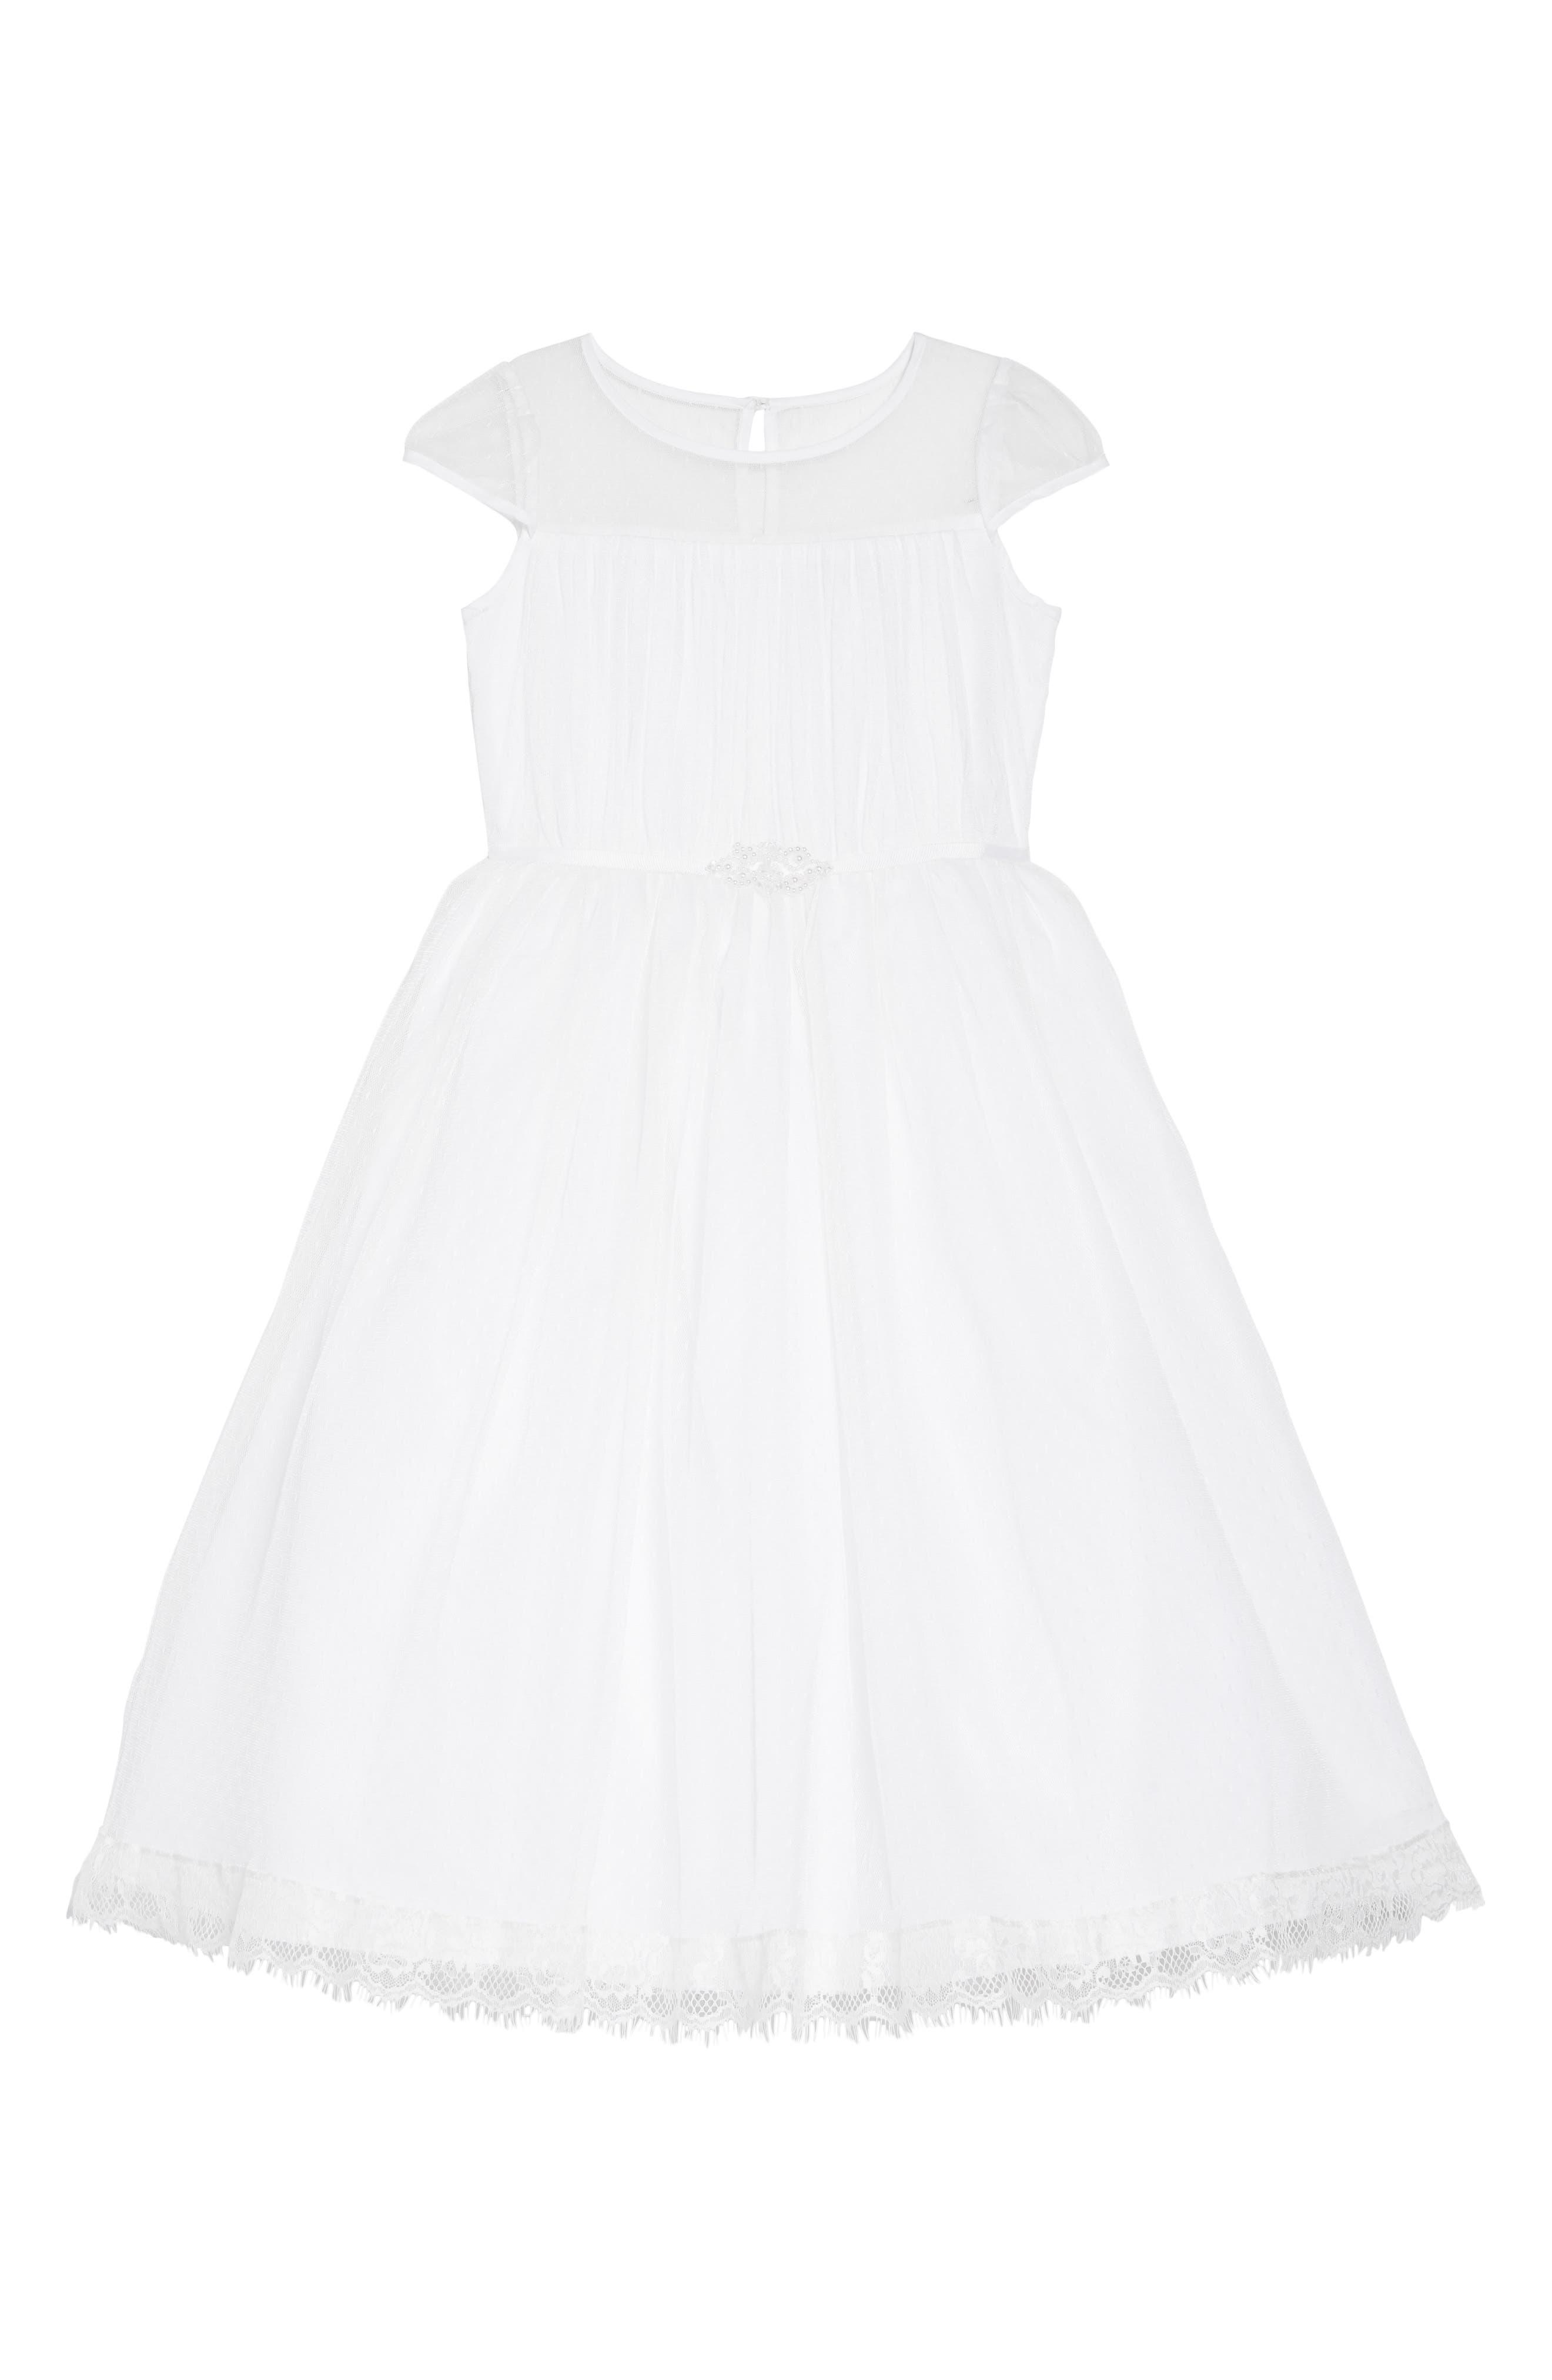 Black First Communion Dress